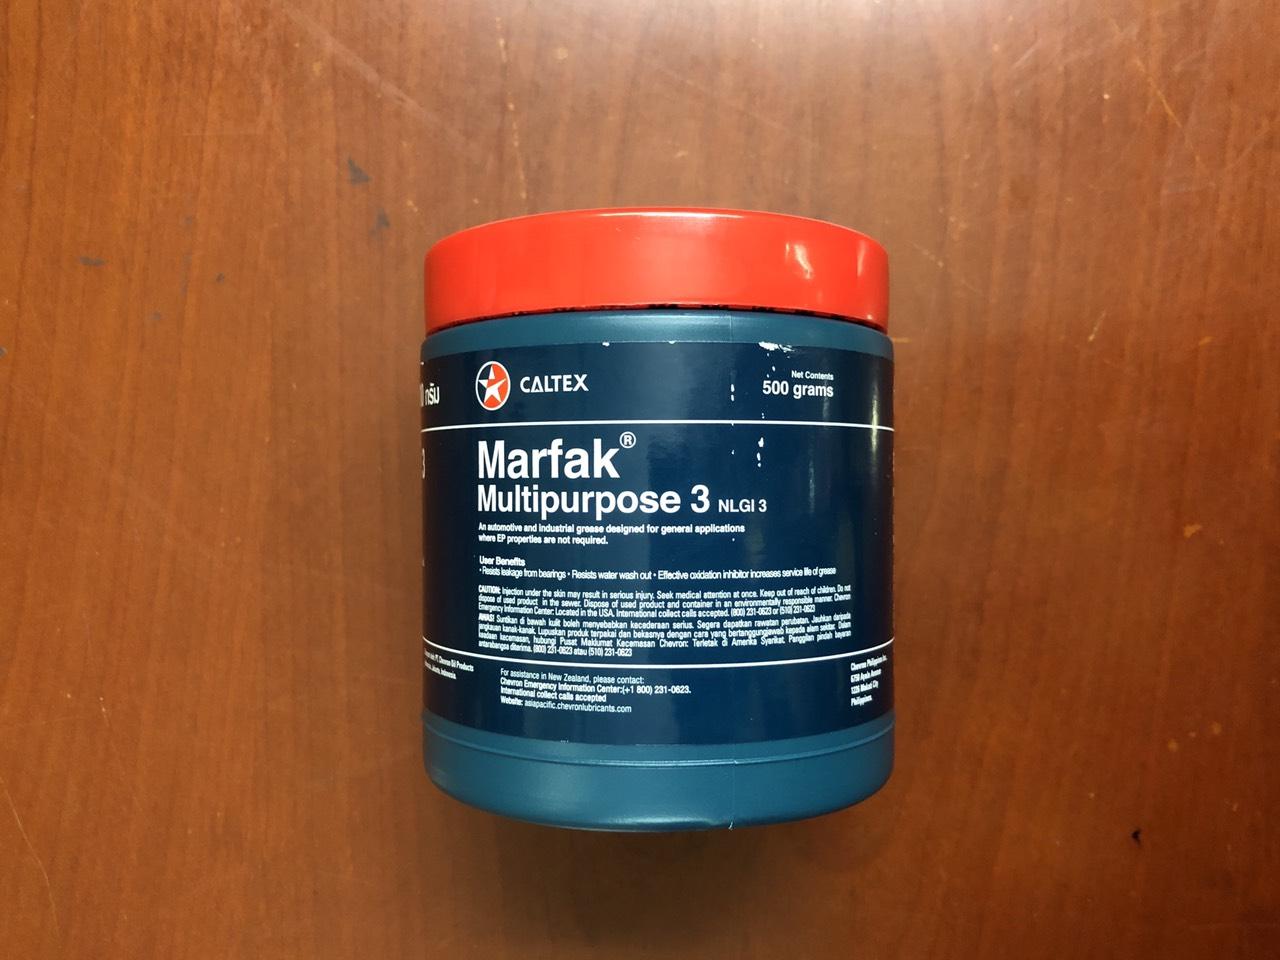 Marfak multipurpose 3